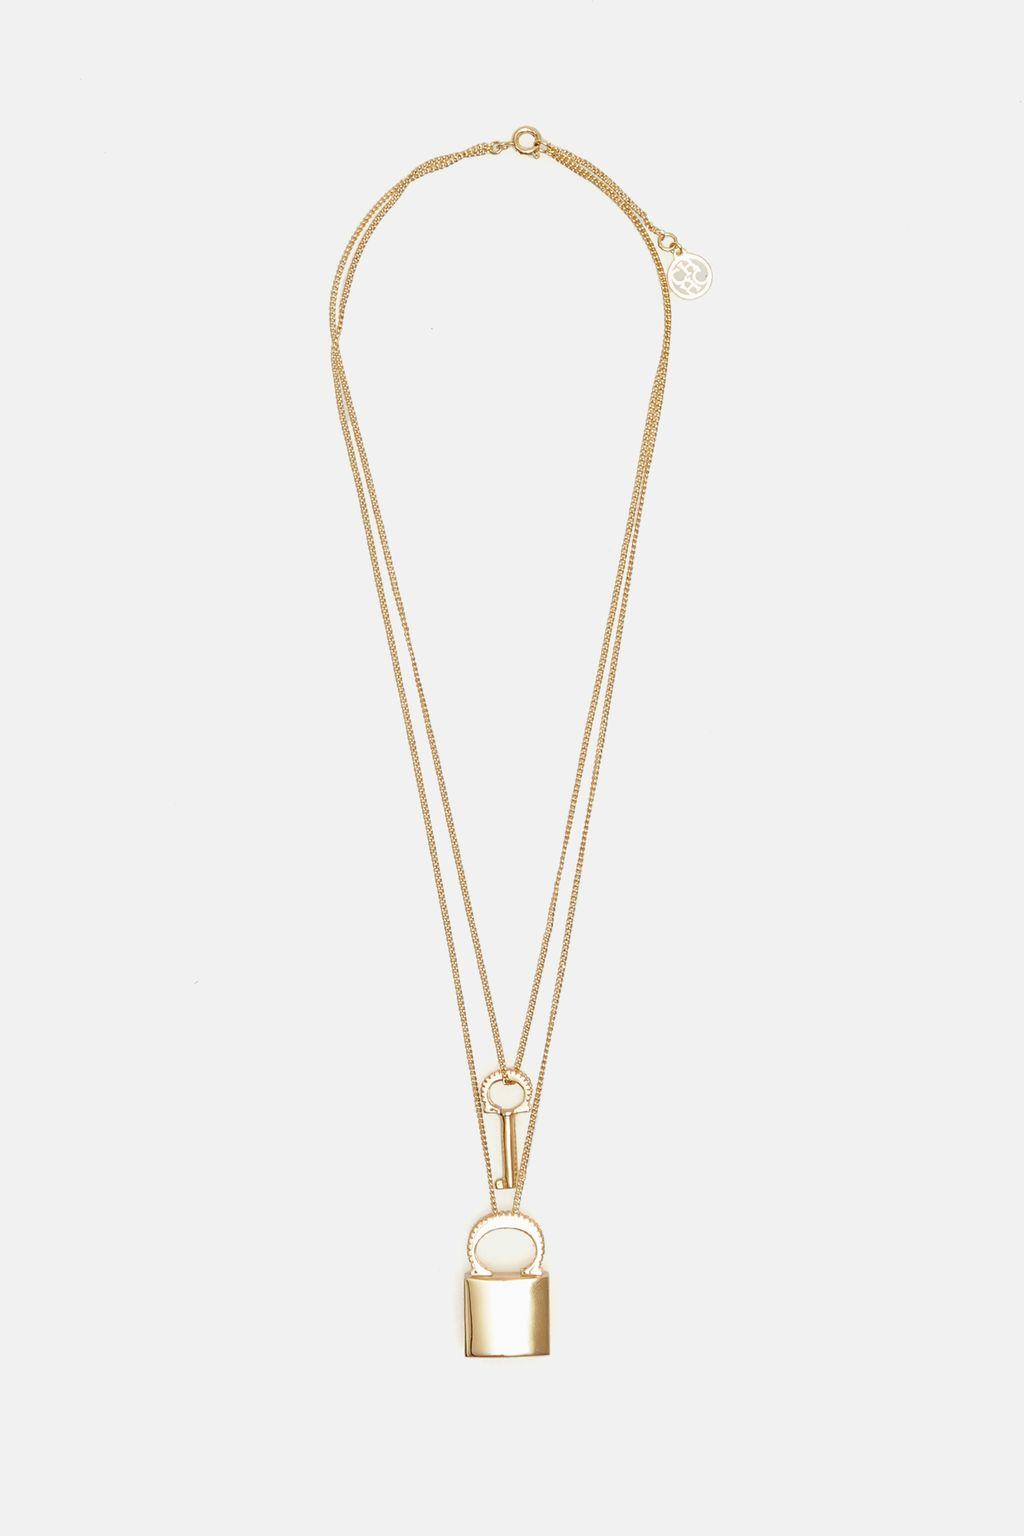 Locked Insignia necklace